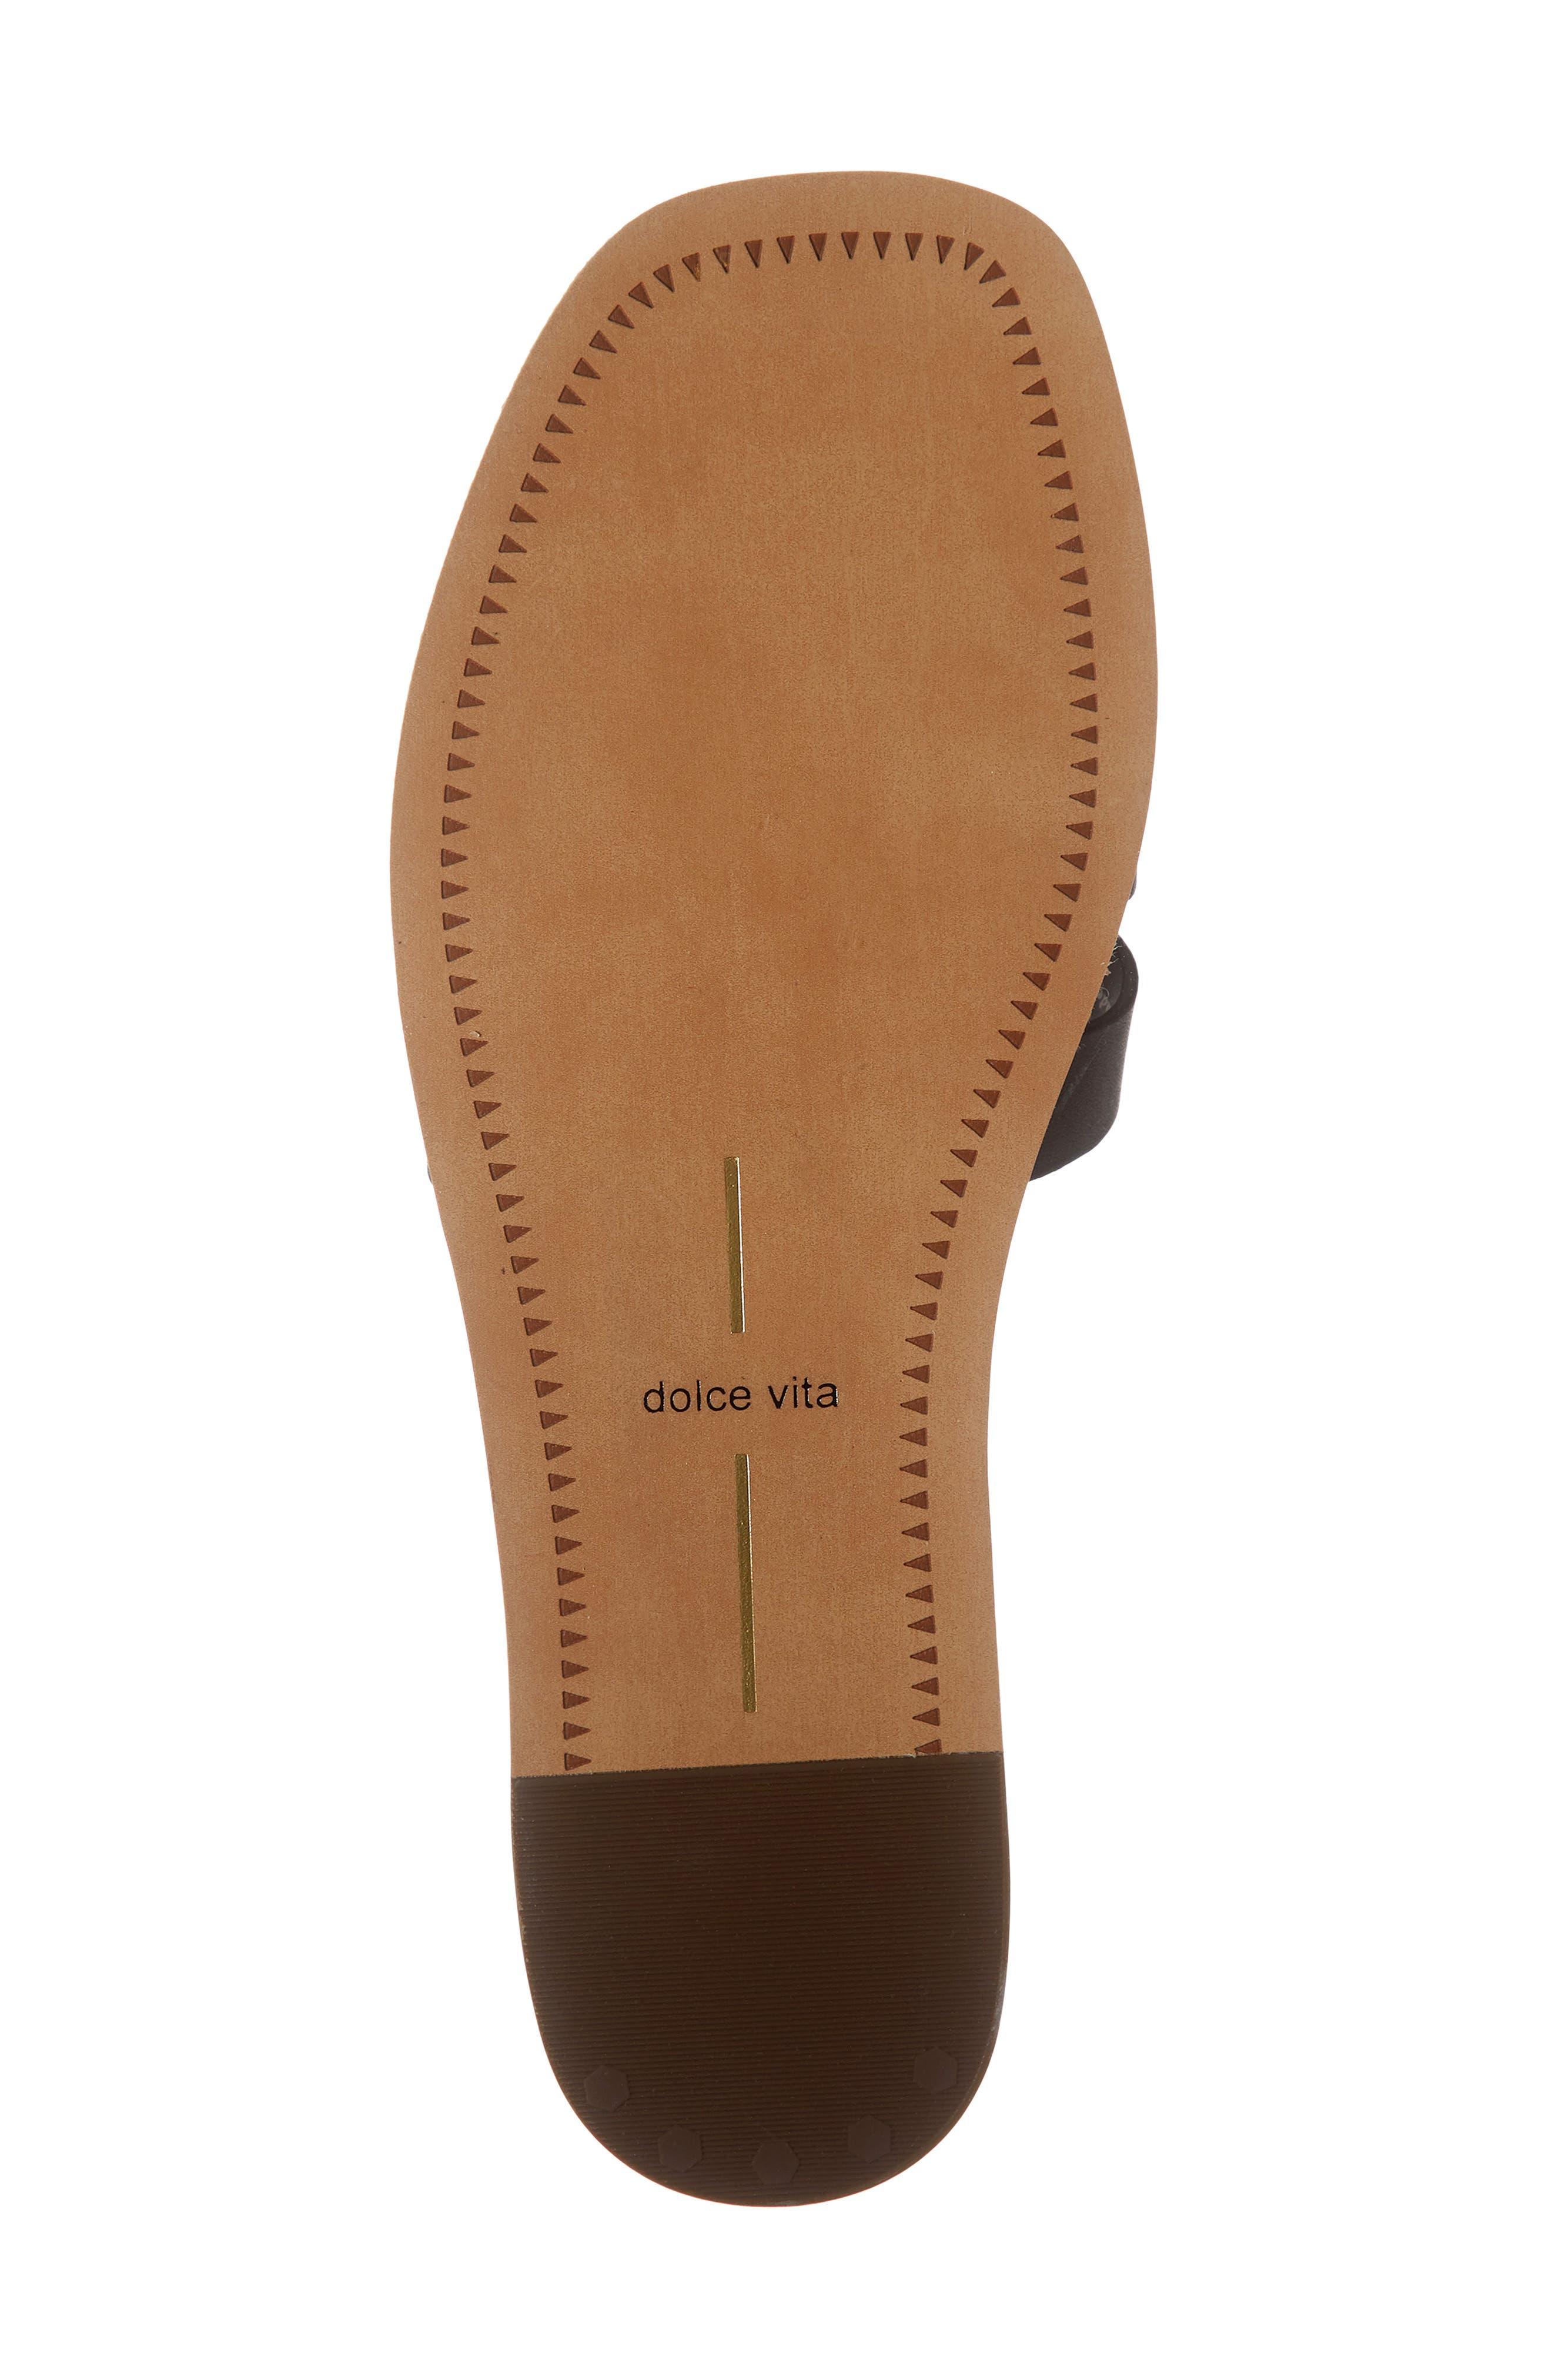 DOLCE VITA, Cait Slide Sandal, Alternate thumbnail 6, color, BLACK LEATHER